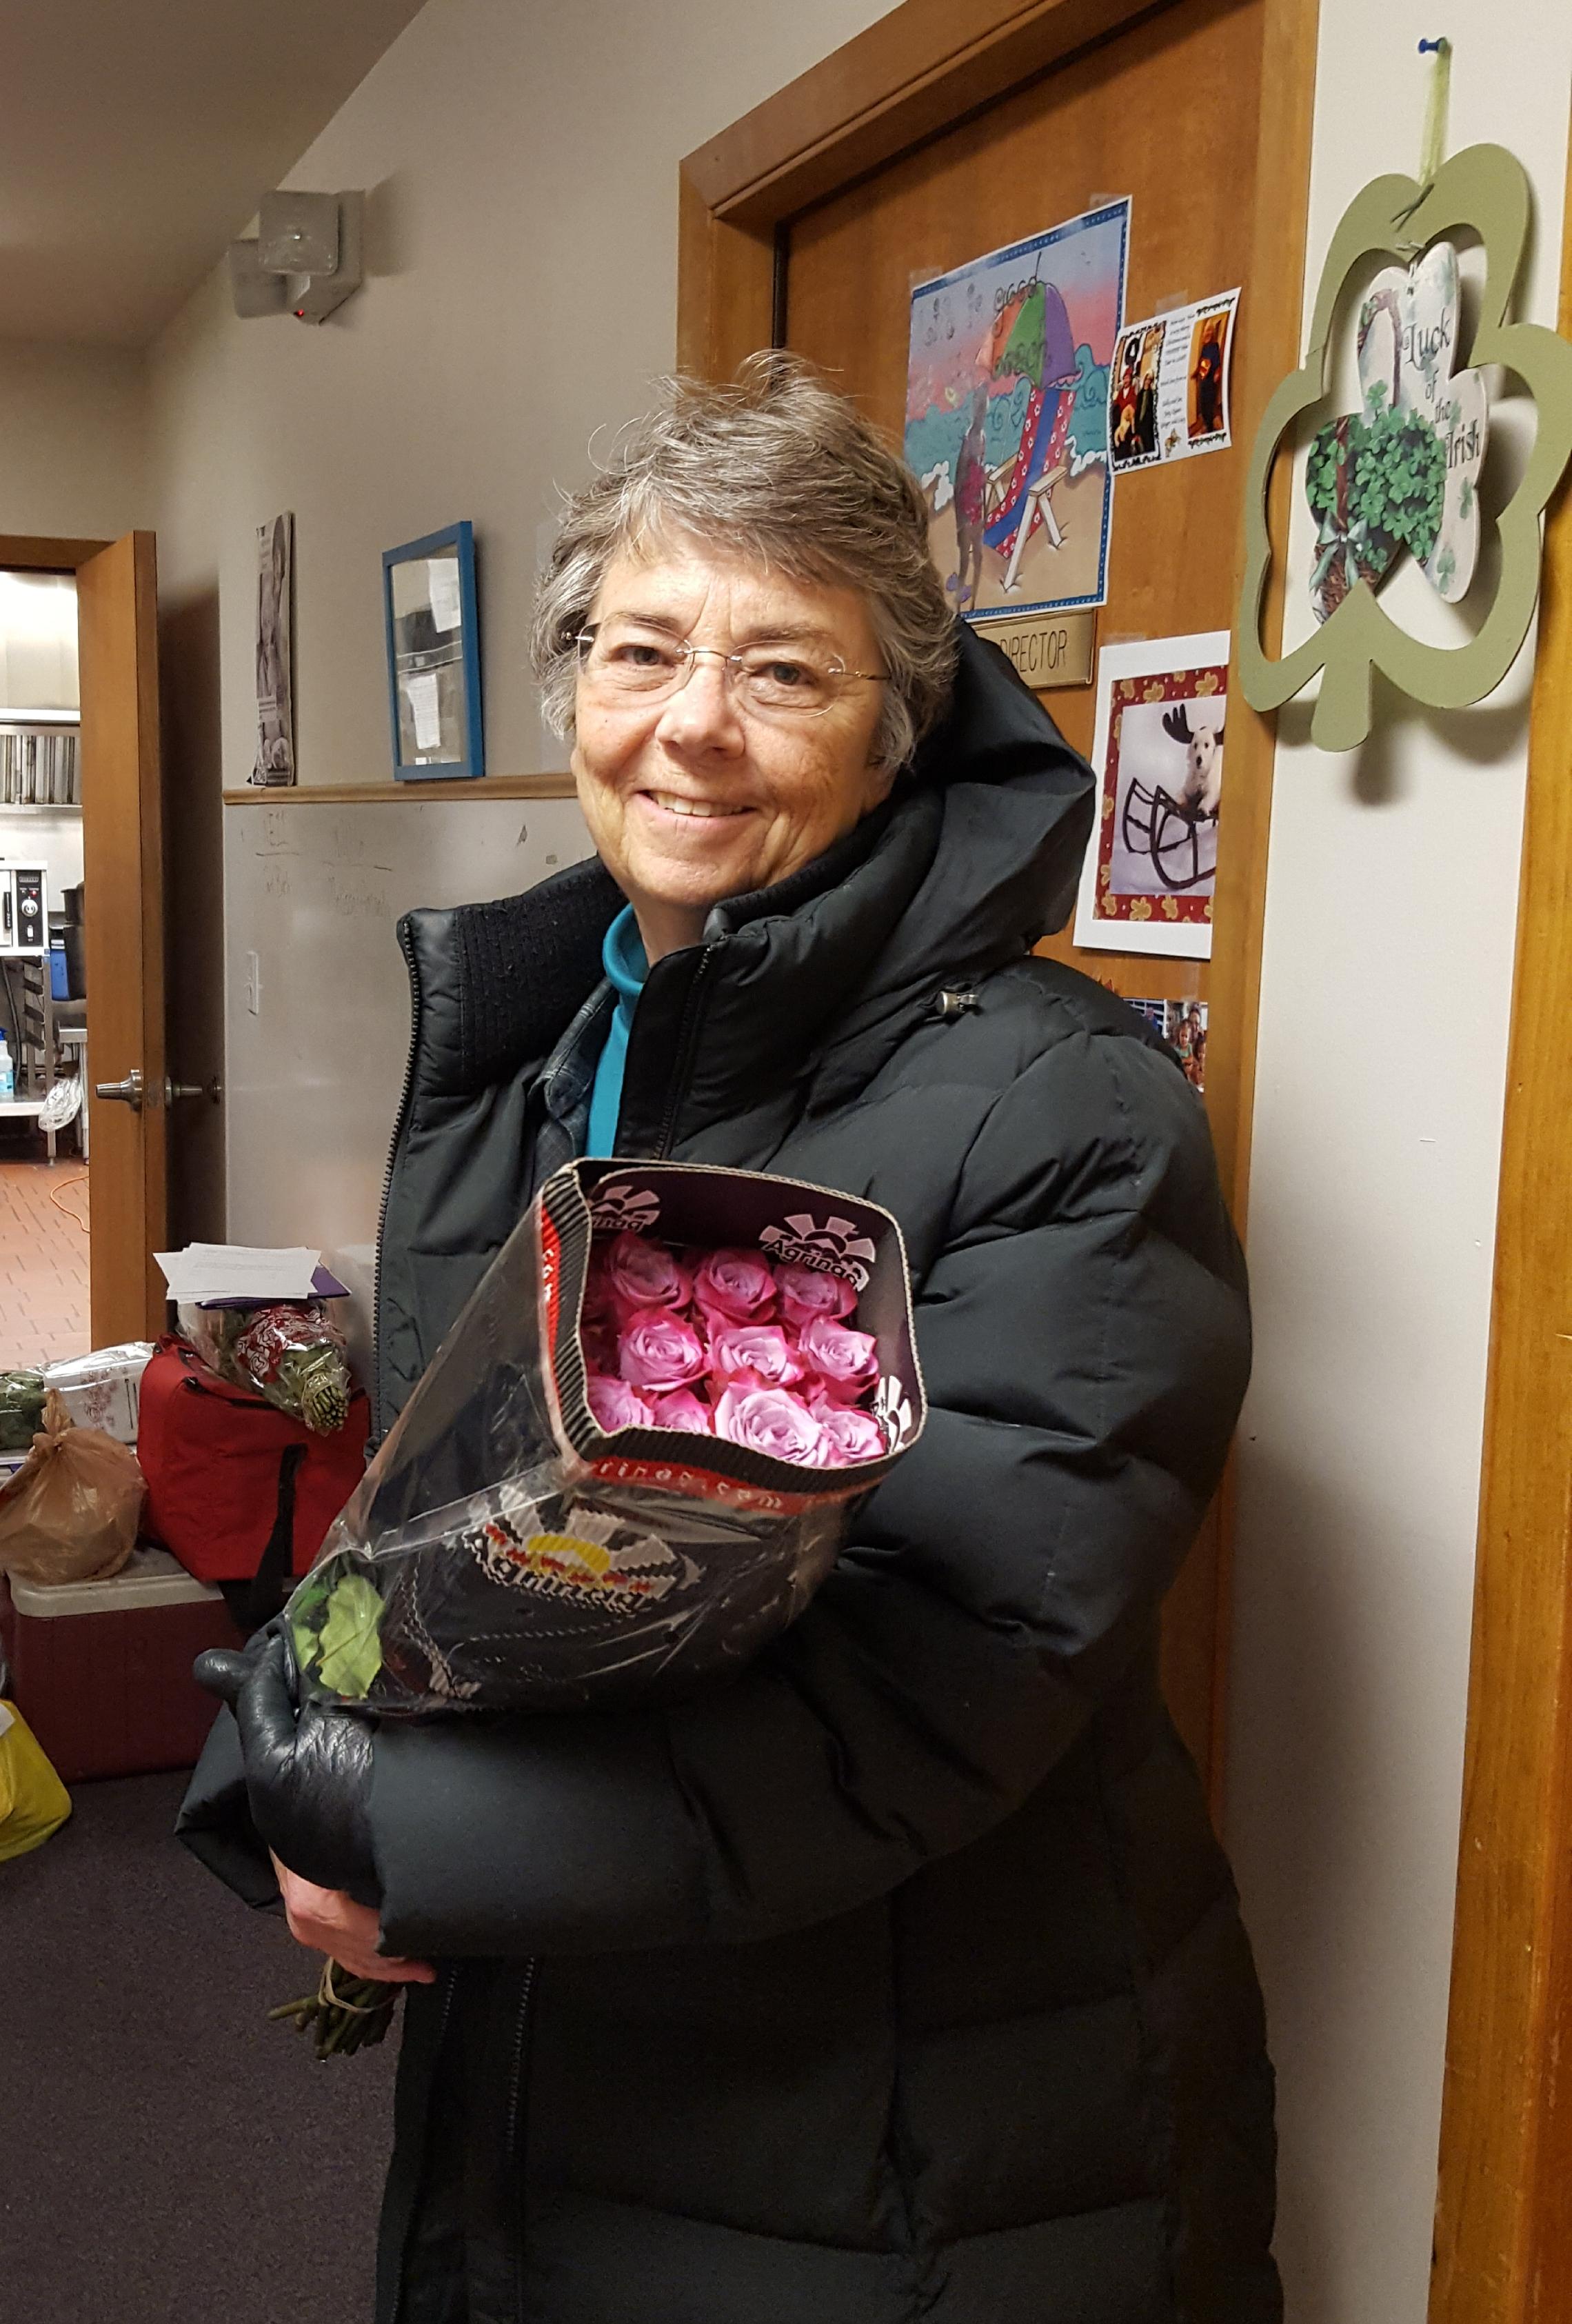 Volunteer Cathy delivering flowers to seniors on her route, 2-22-18.jpg